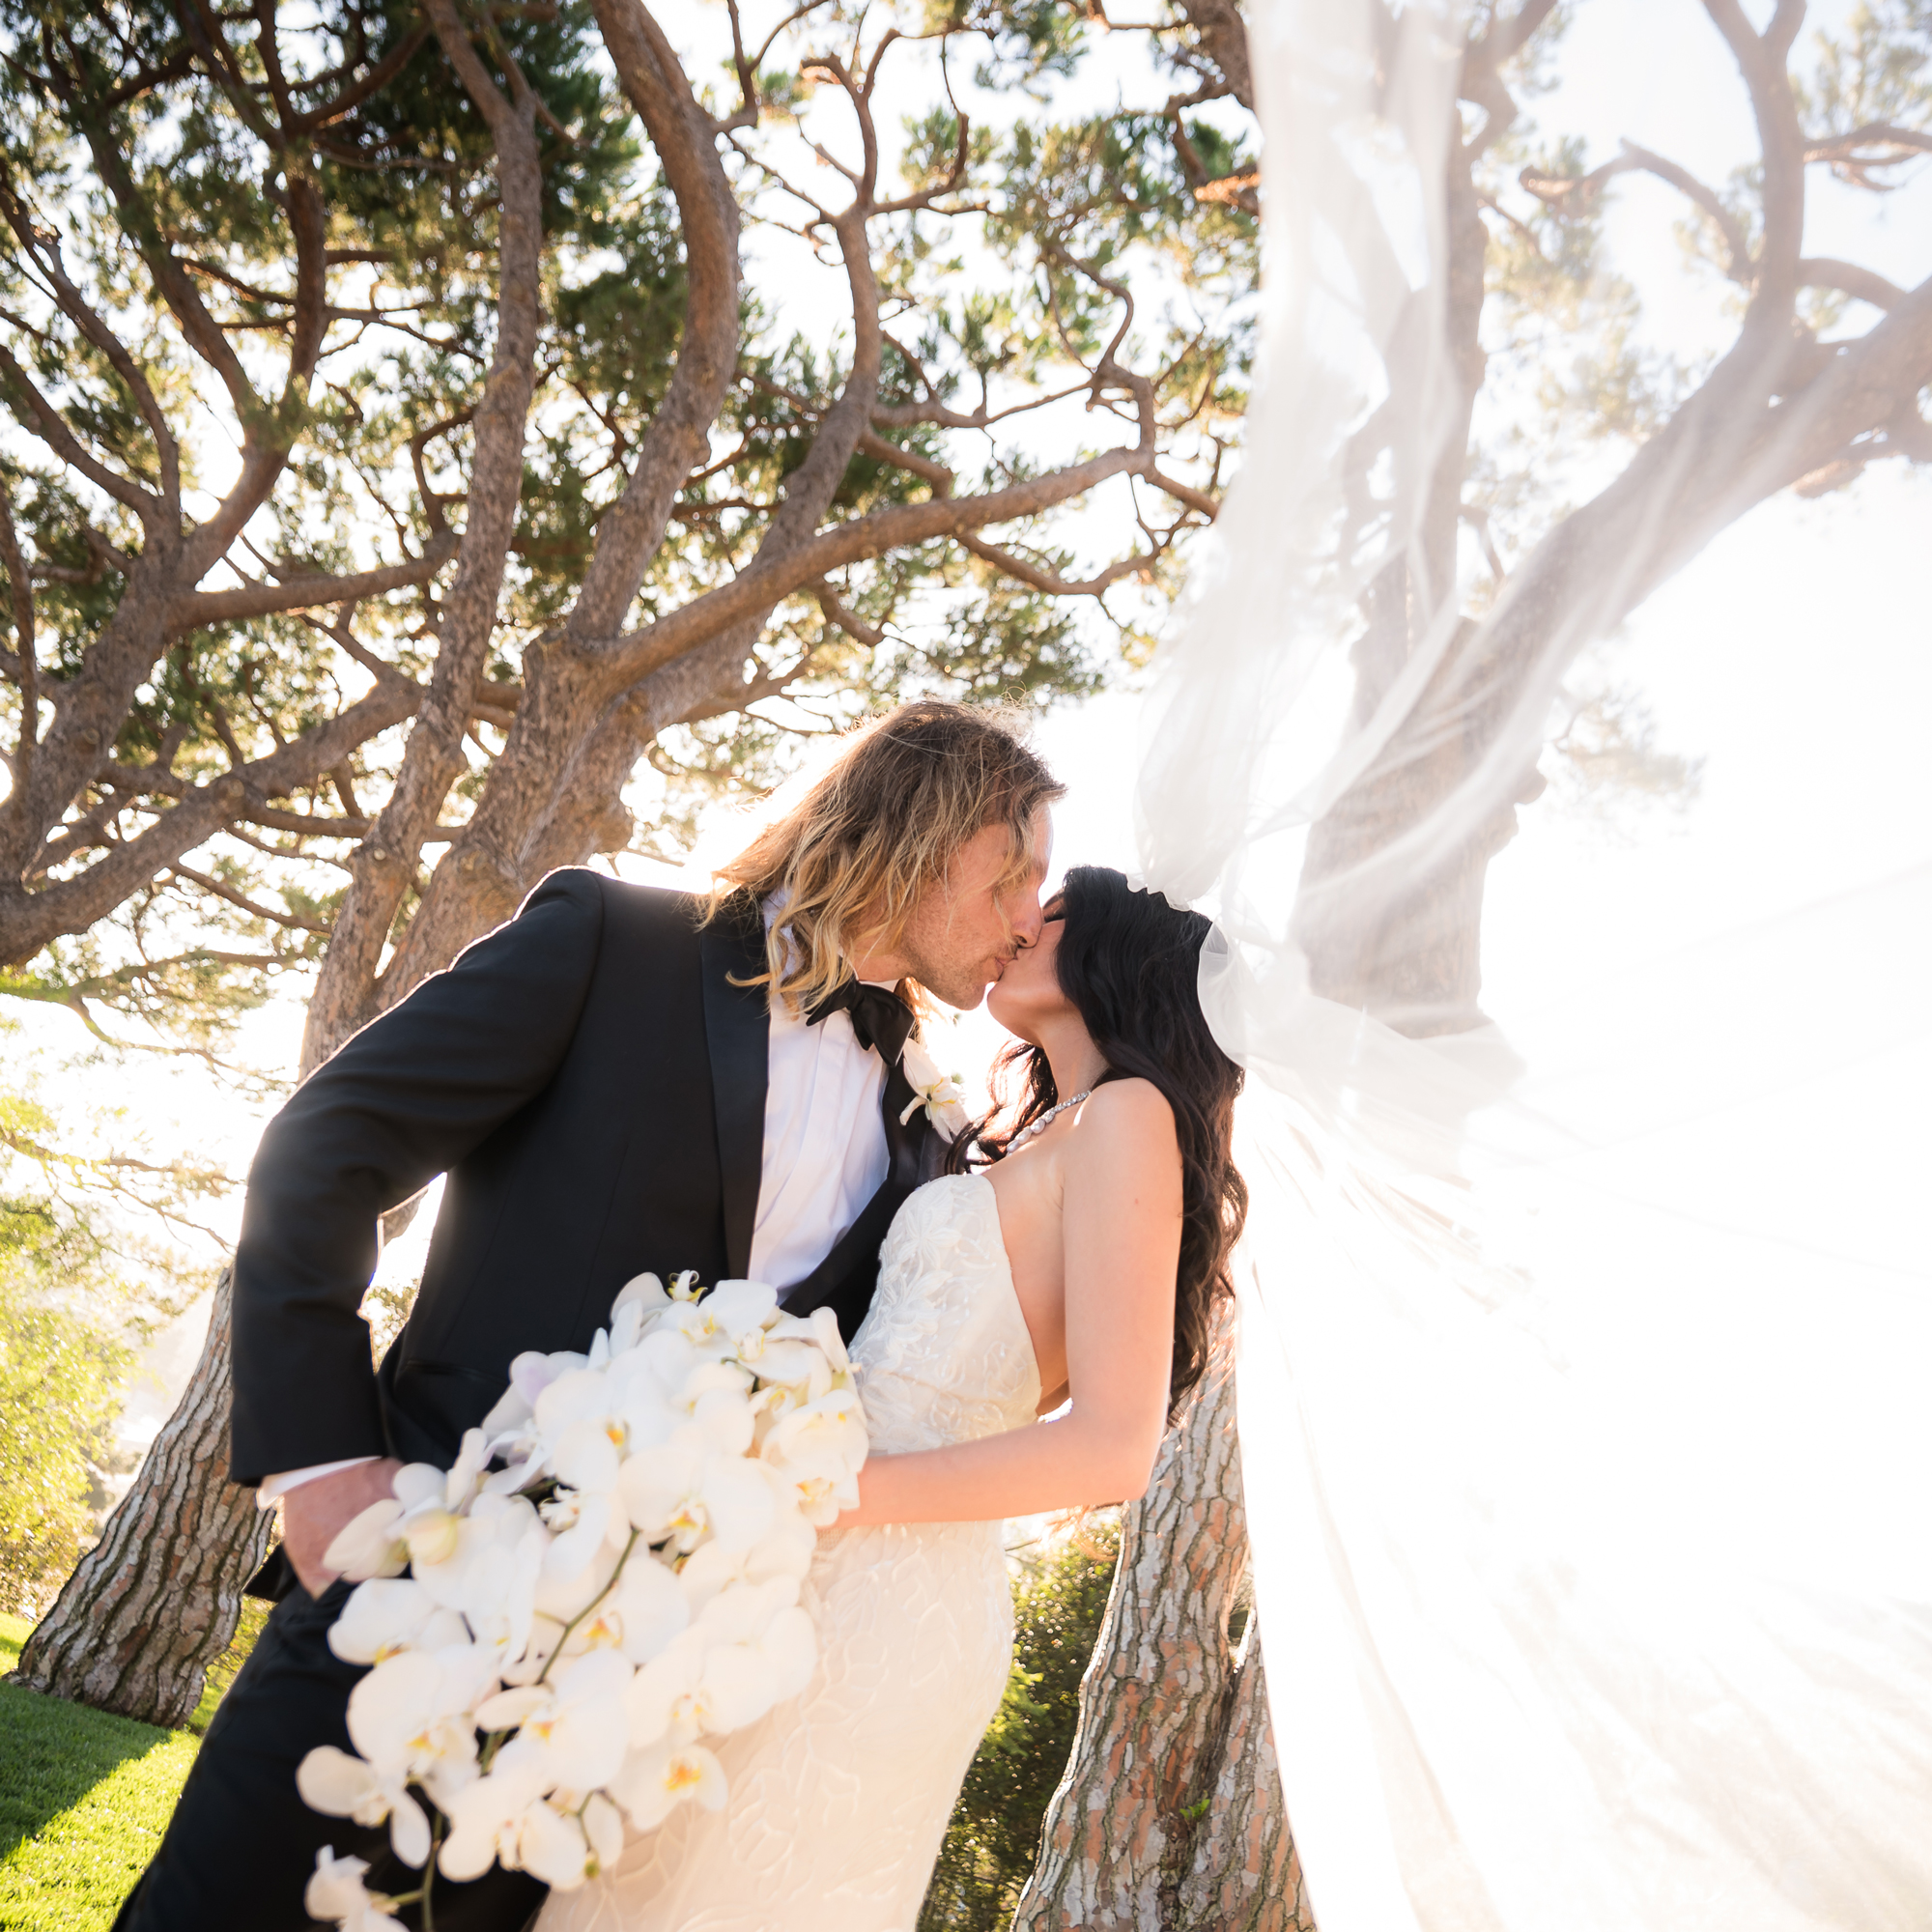 41-wayferers-chapel-wedding-photography-palos-verdes-ca